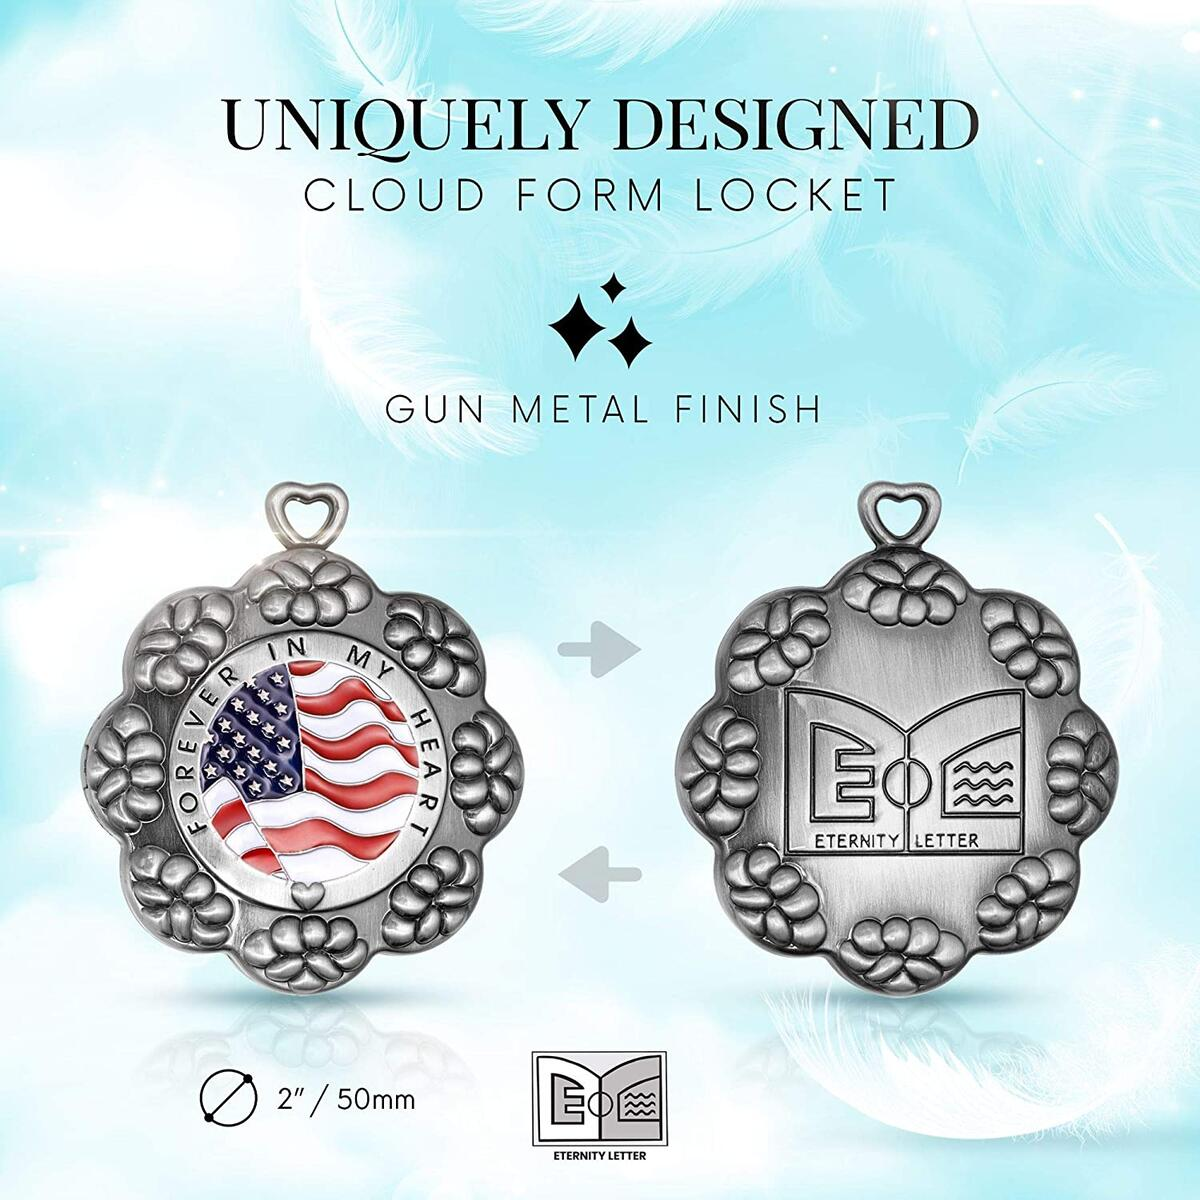 Eternity Letter Presents 2 in 1 Cloud Letter Locket - Gun Metal Finish Locket Keychain That Holds Letter - Vintage Locket Necklace for Women & Men - 1 Pack Includes Key Ring, & 2 Envelopes